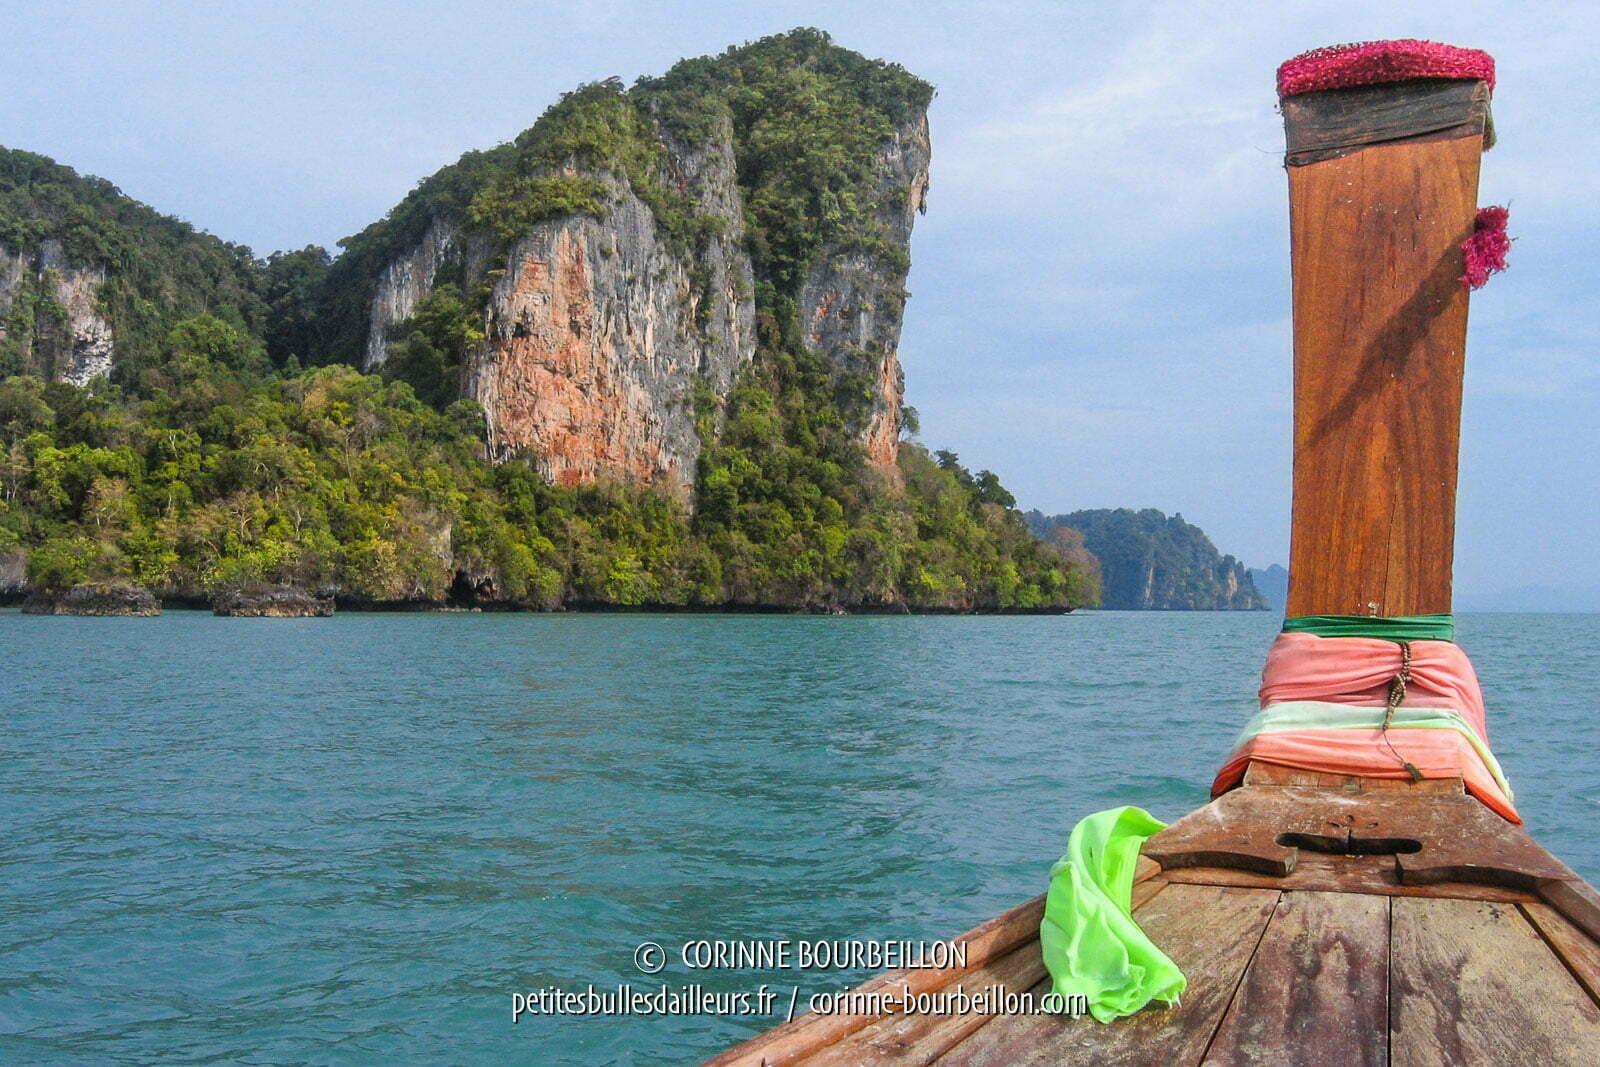 Balade dans la baie de Phang Nga. Thaïlande, février 2009.